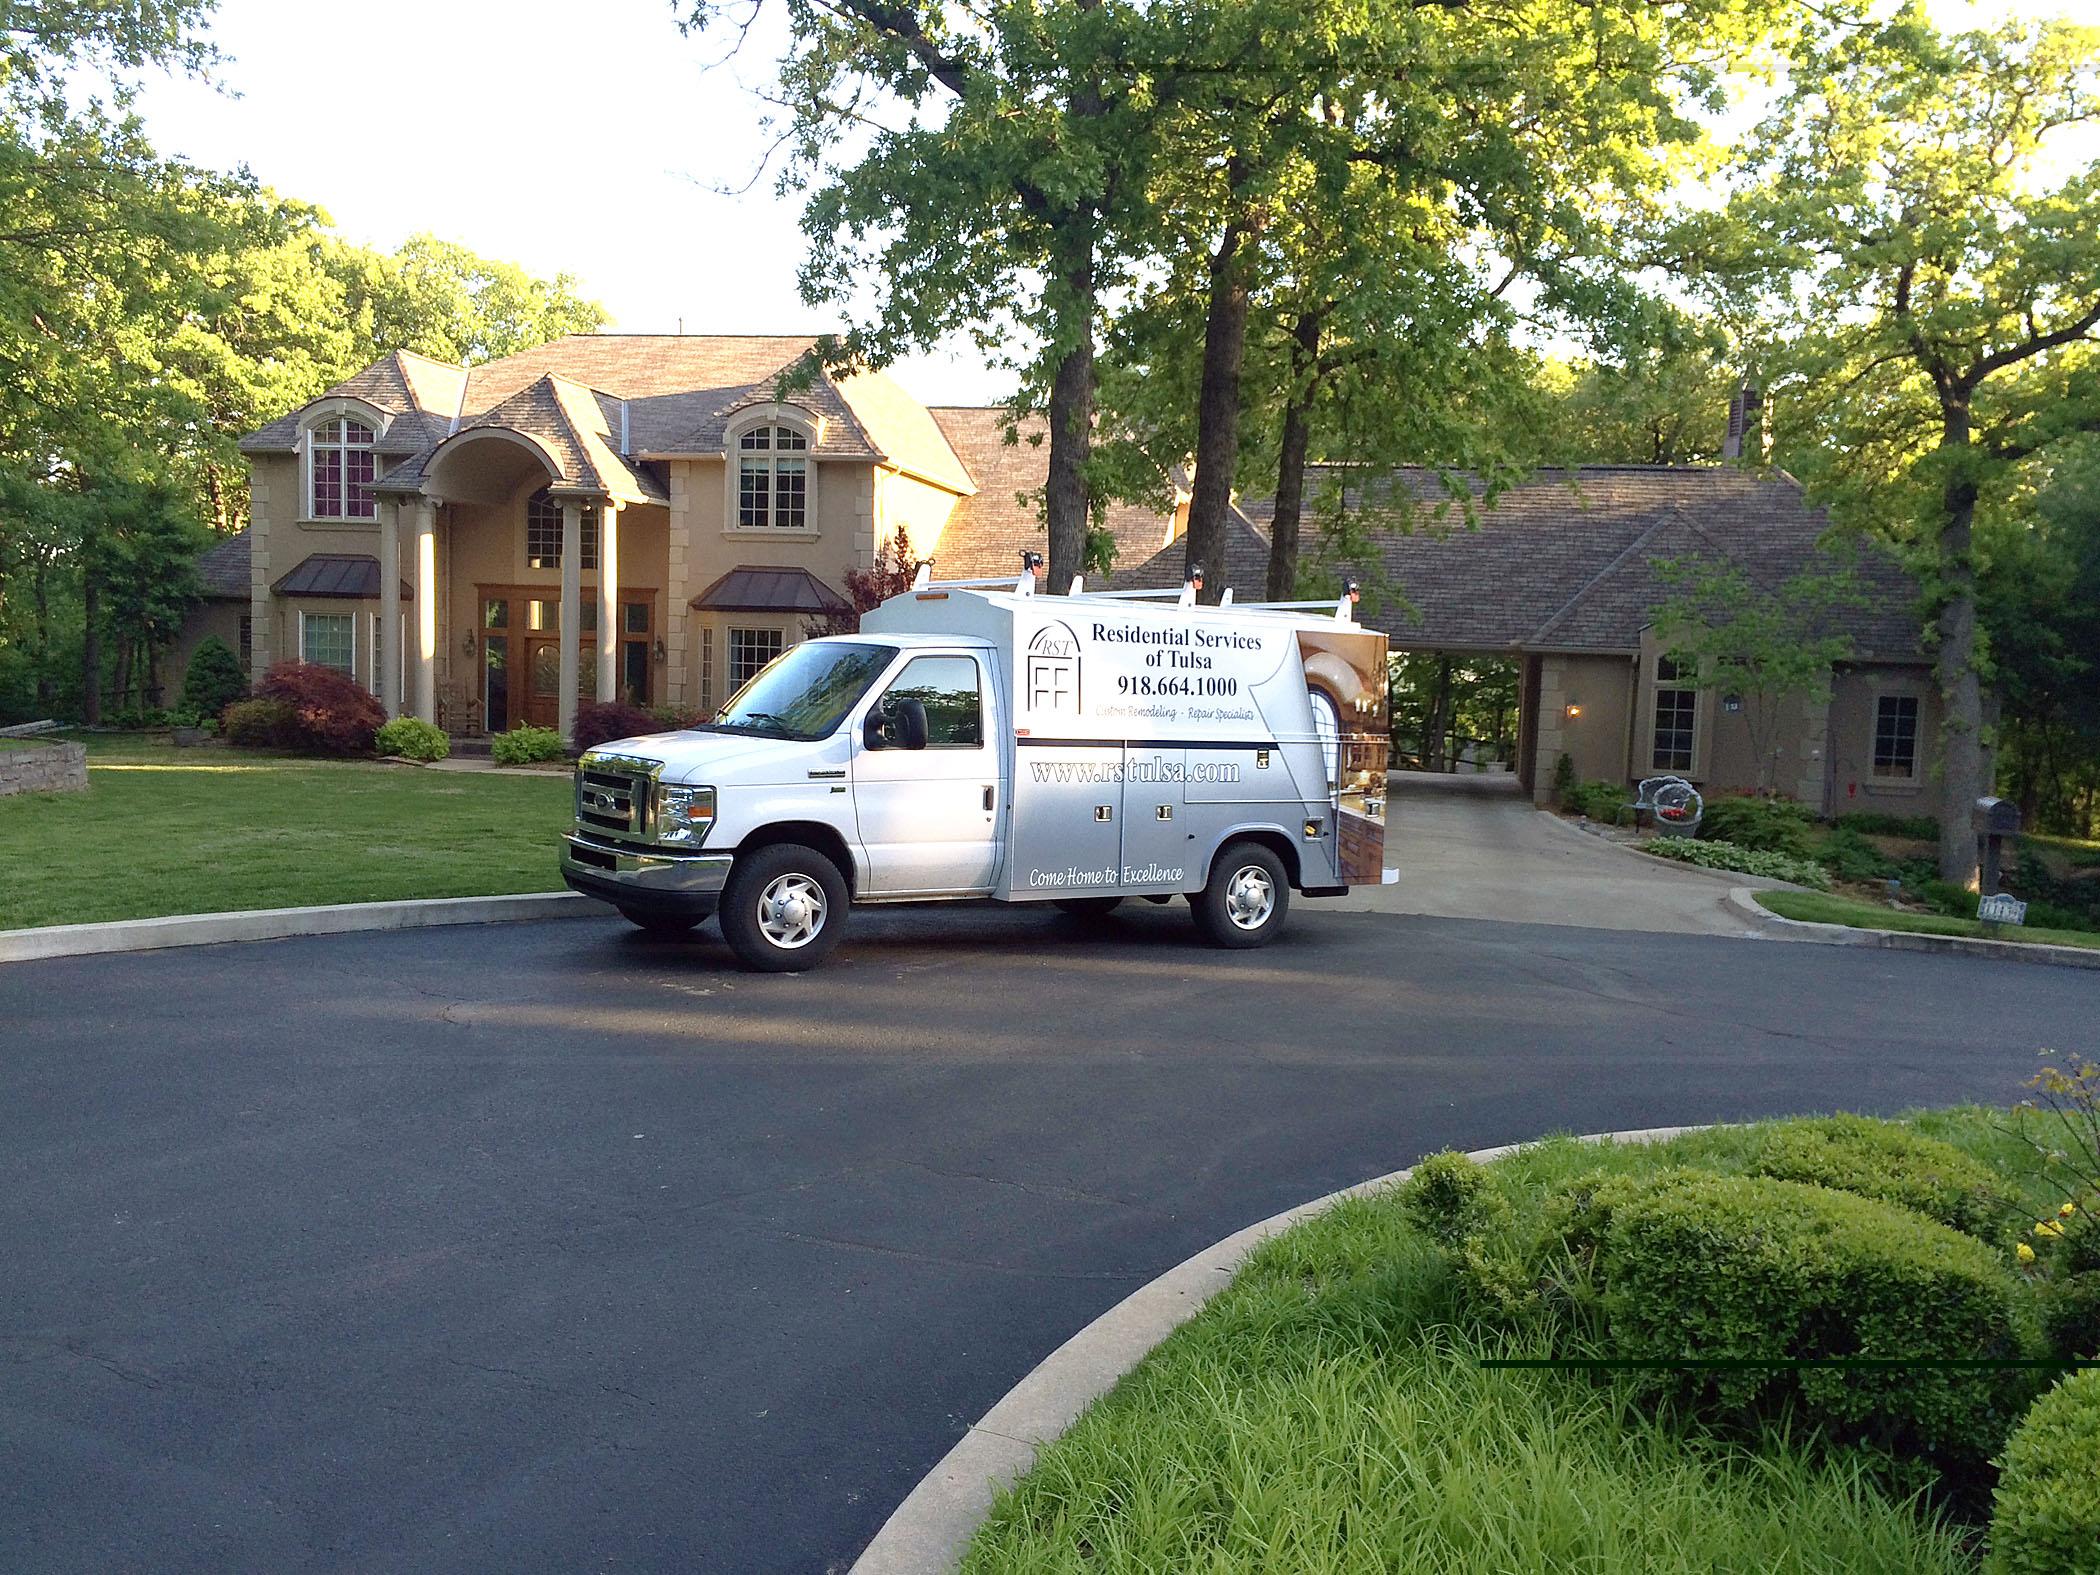 Remodeling Company Tulsa - Van